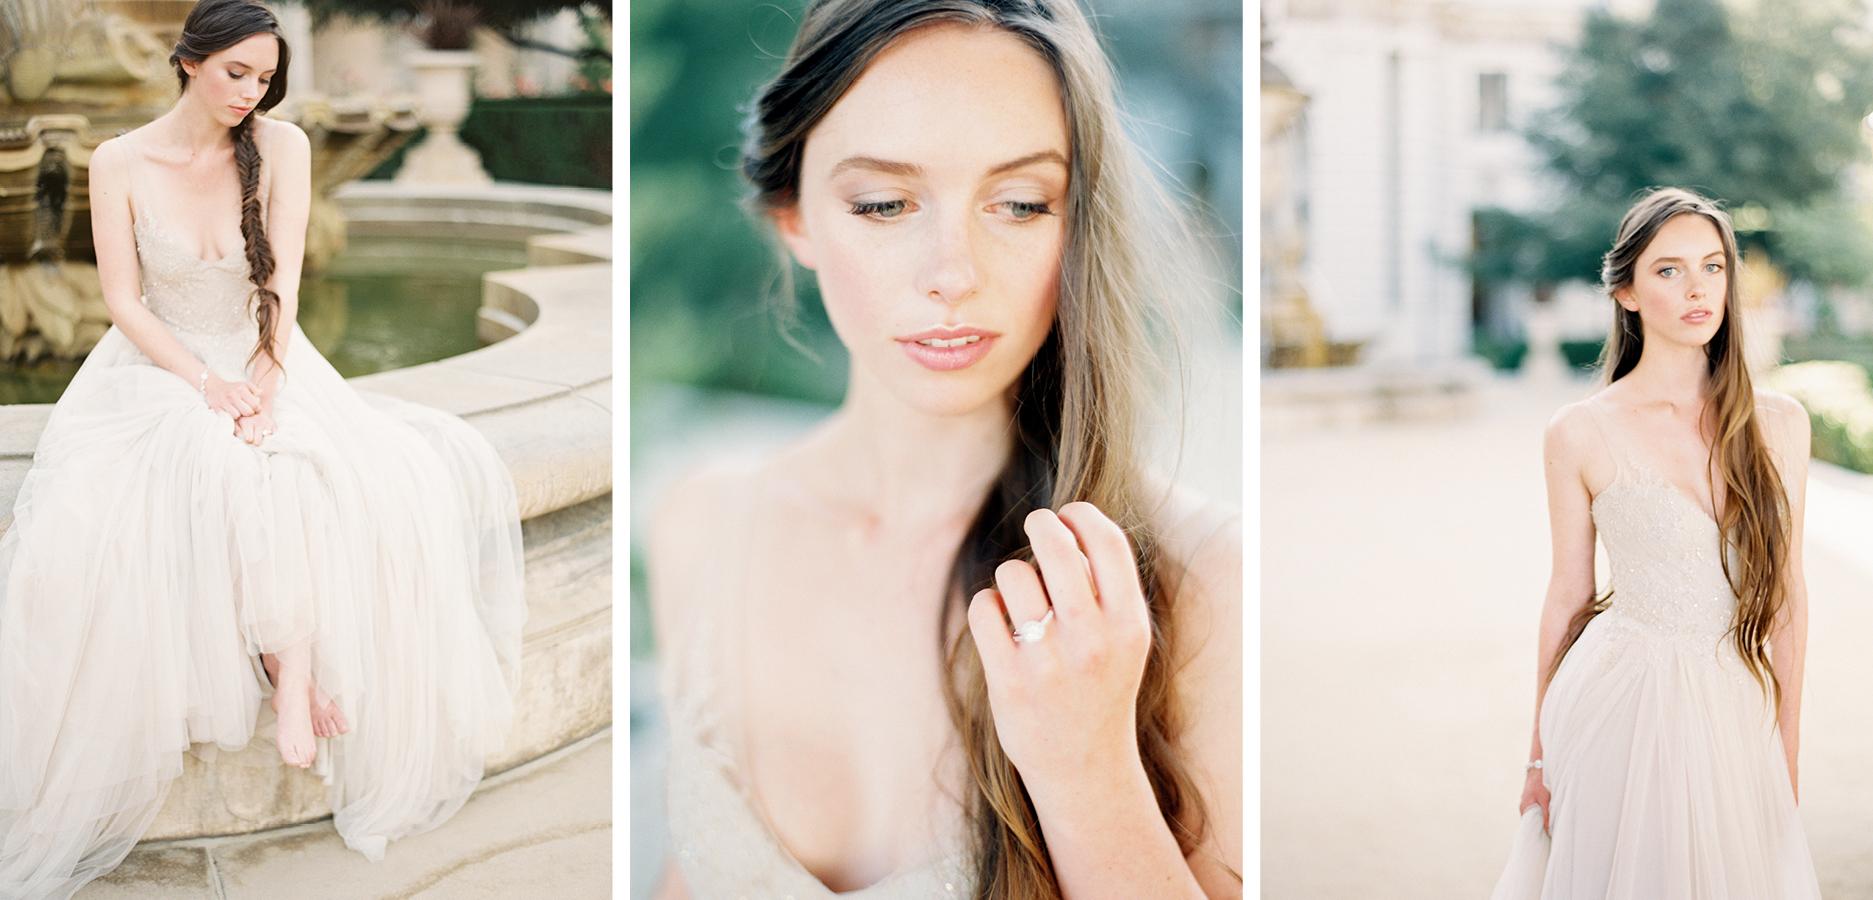 Jess-Wilcox-Hair-Makeup-Wedding-Homepage_3.jpg